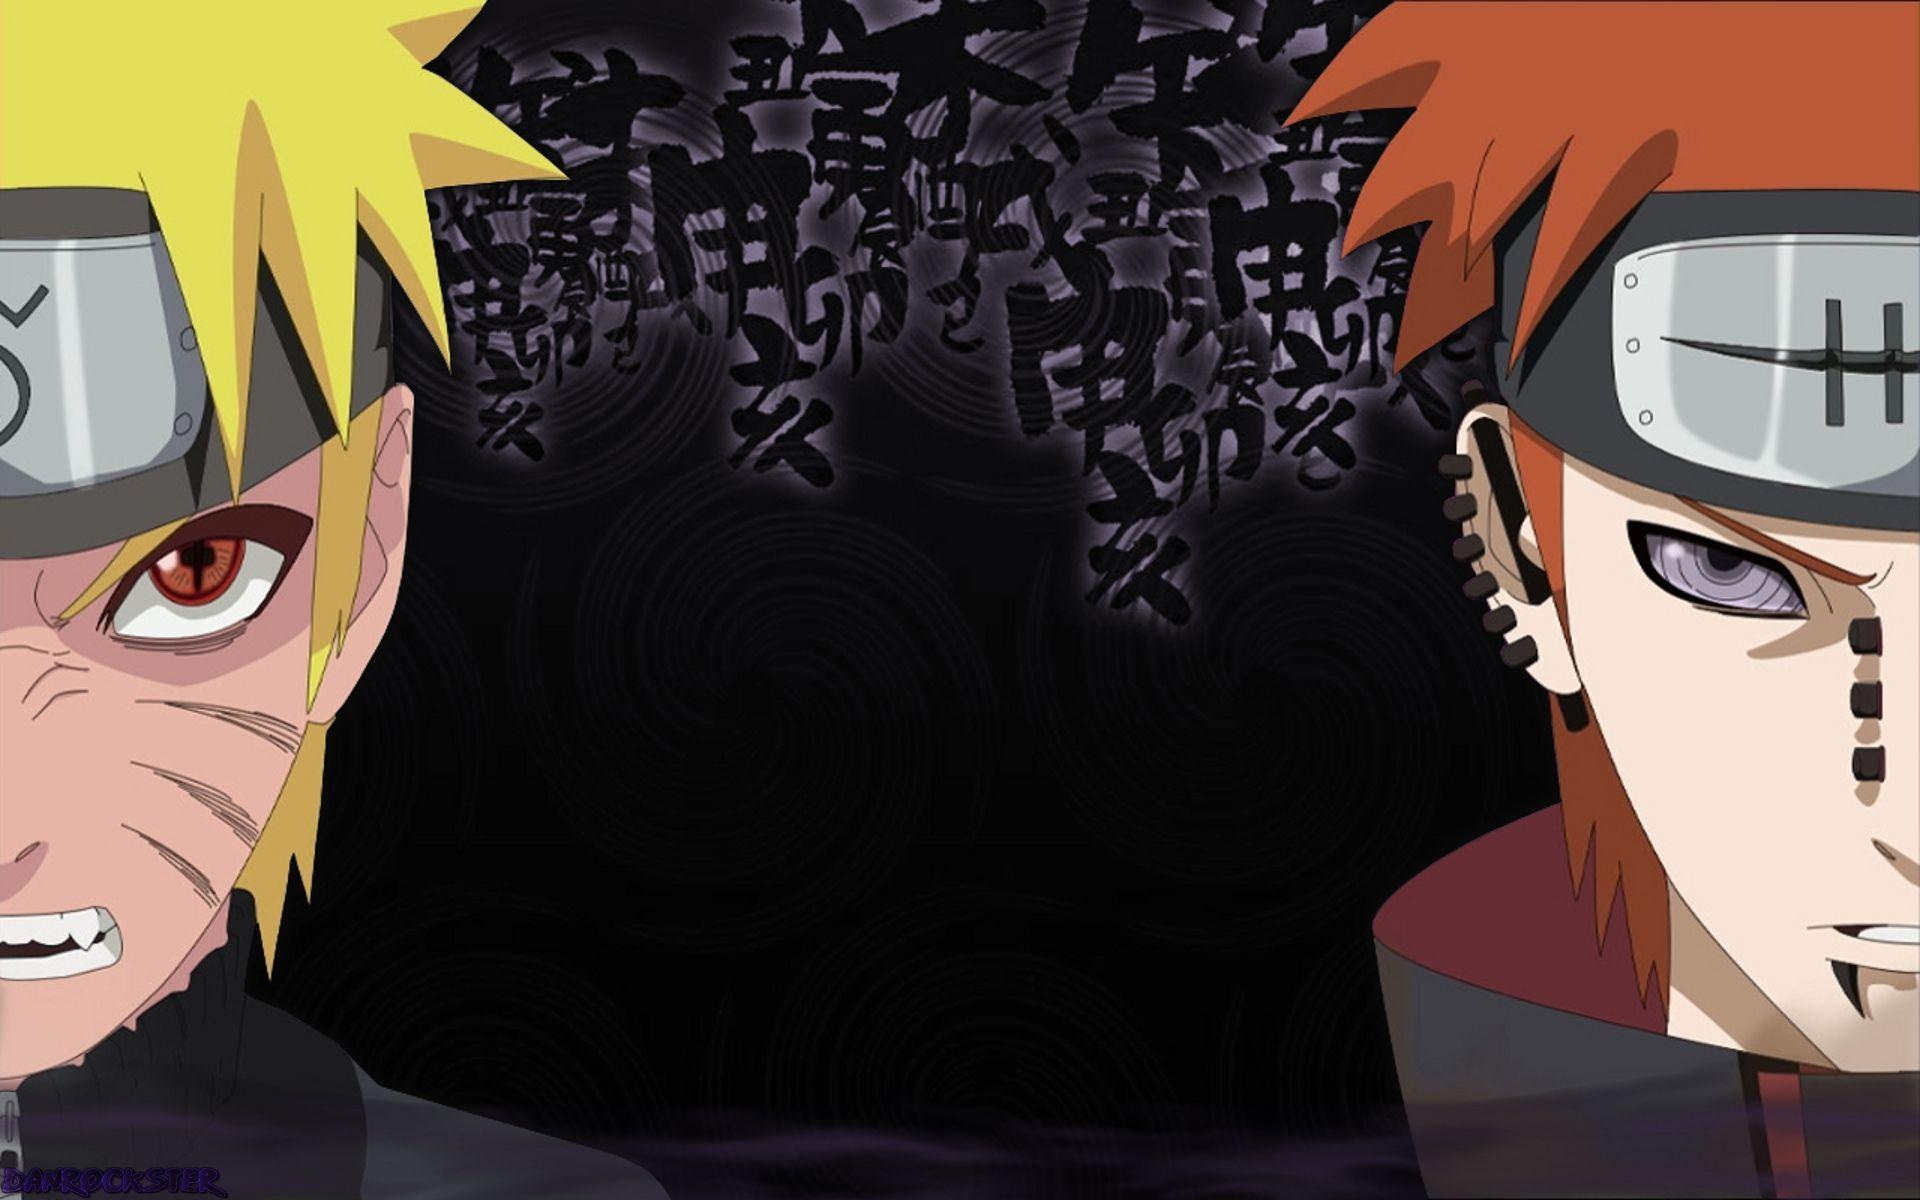 narutoshippudenpainwallpapertmWB Naruto Pinterest